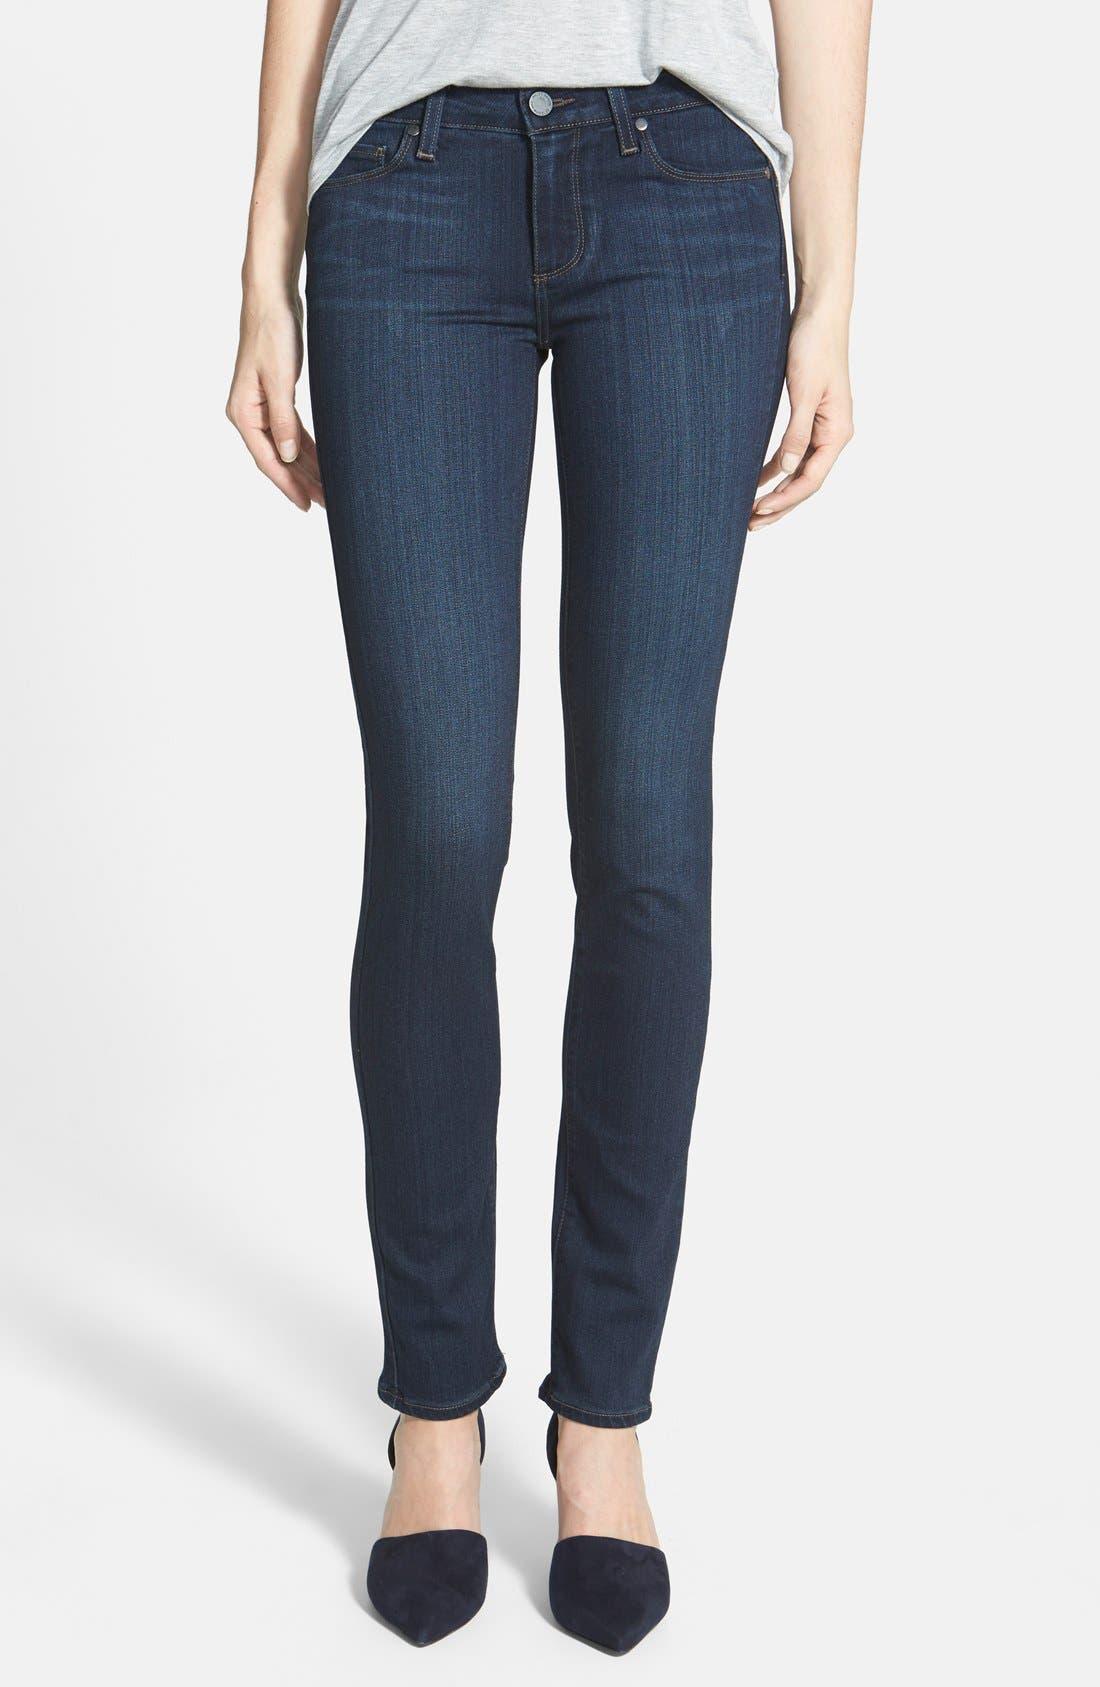 Alternate Image 1 Selected - Paige Denim 'Skyline' Skinny Jeans (Cameron)